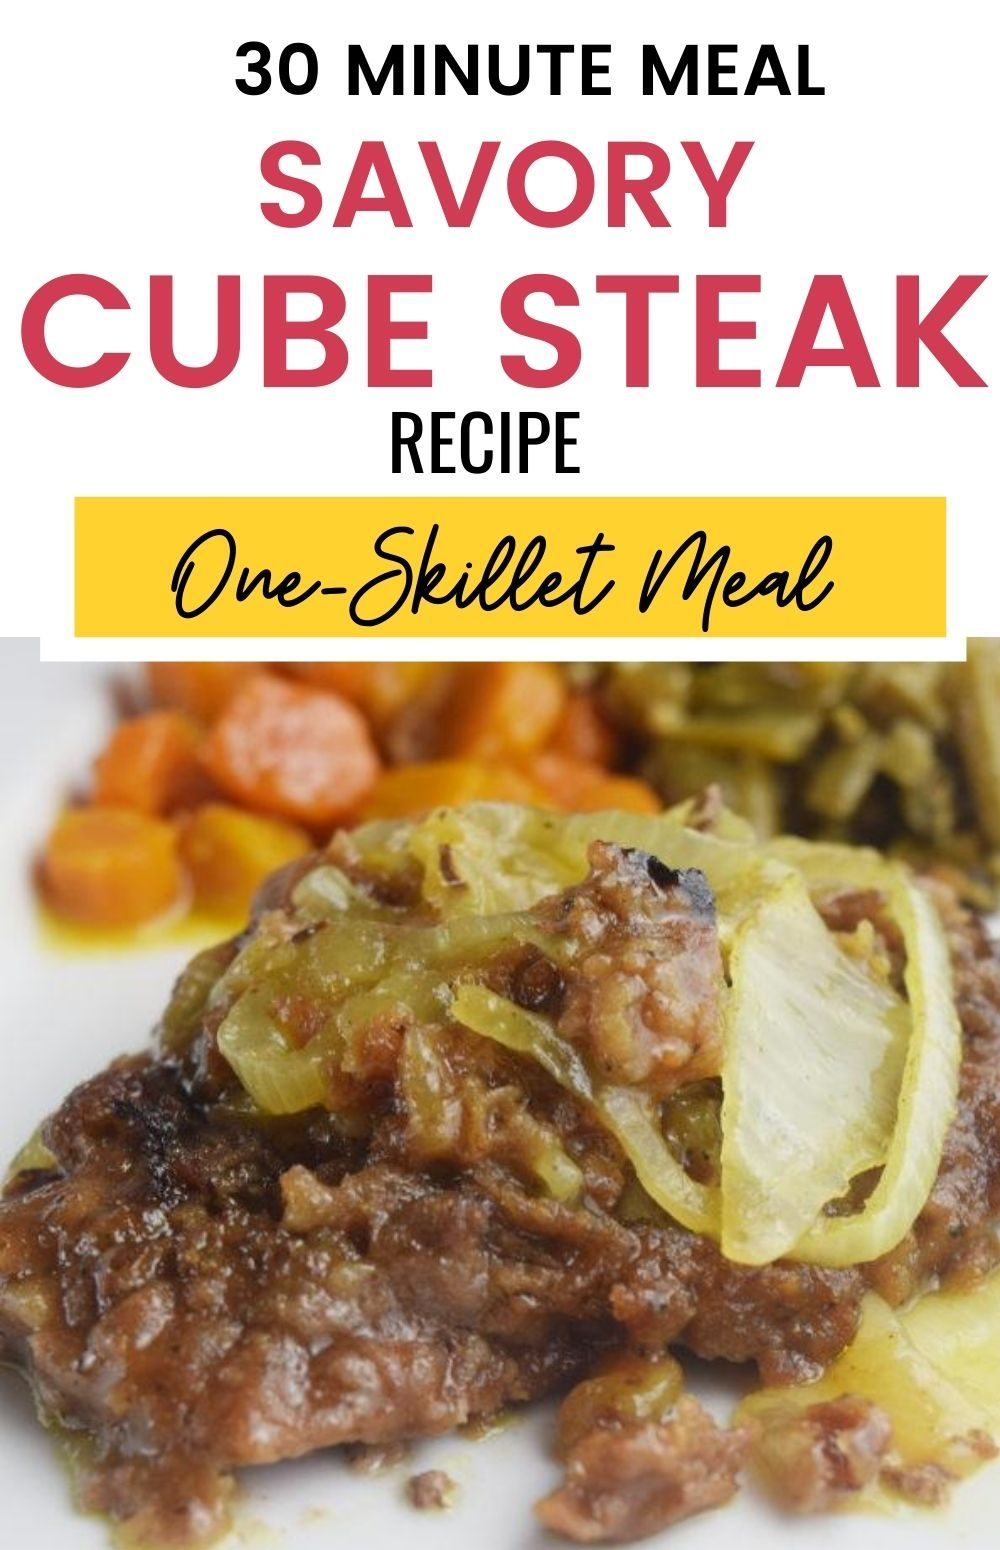 Pork Cube Steak Recipes Healthy